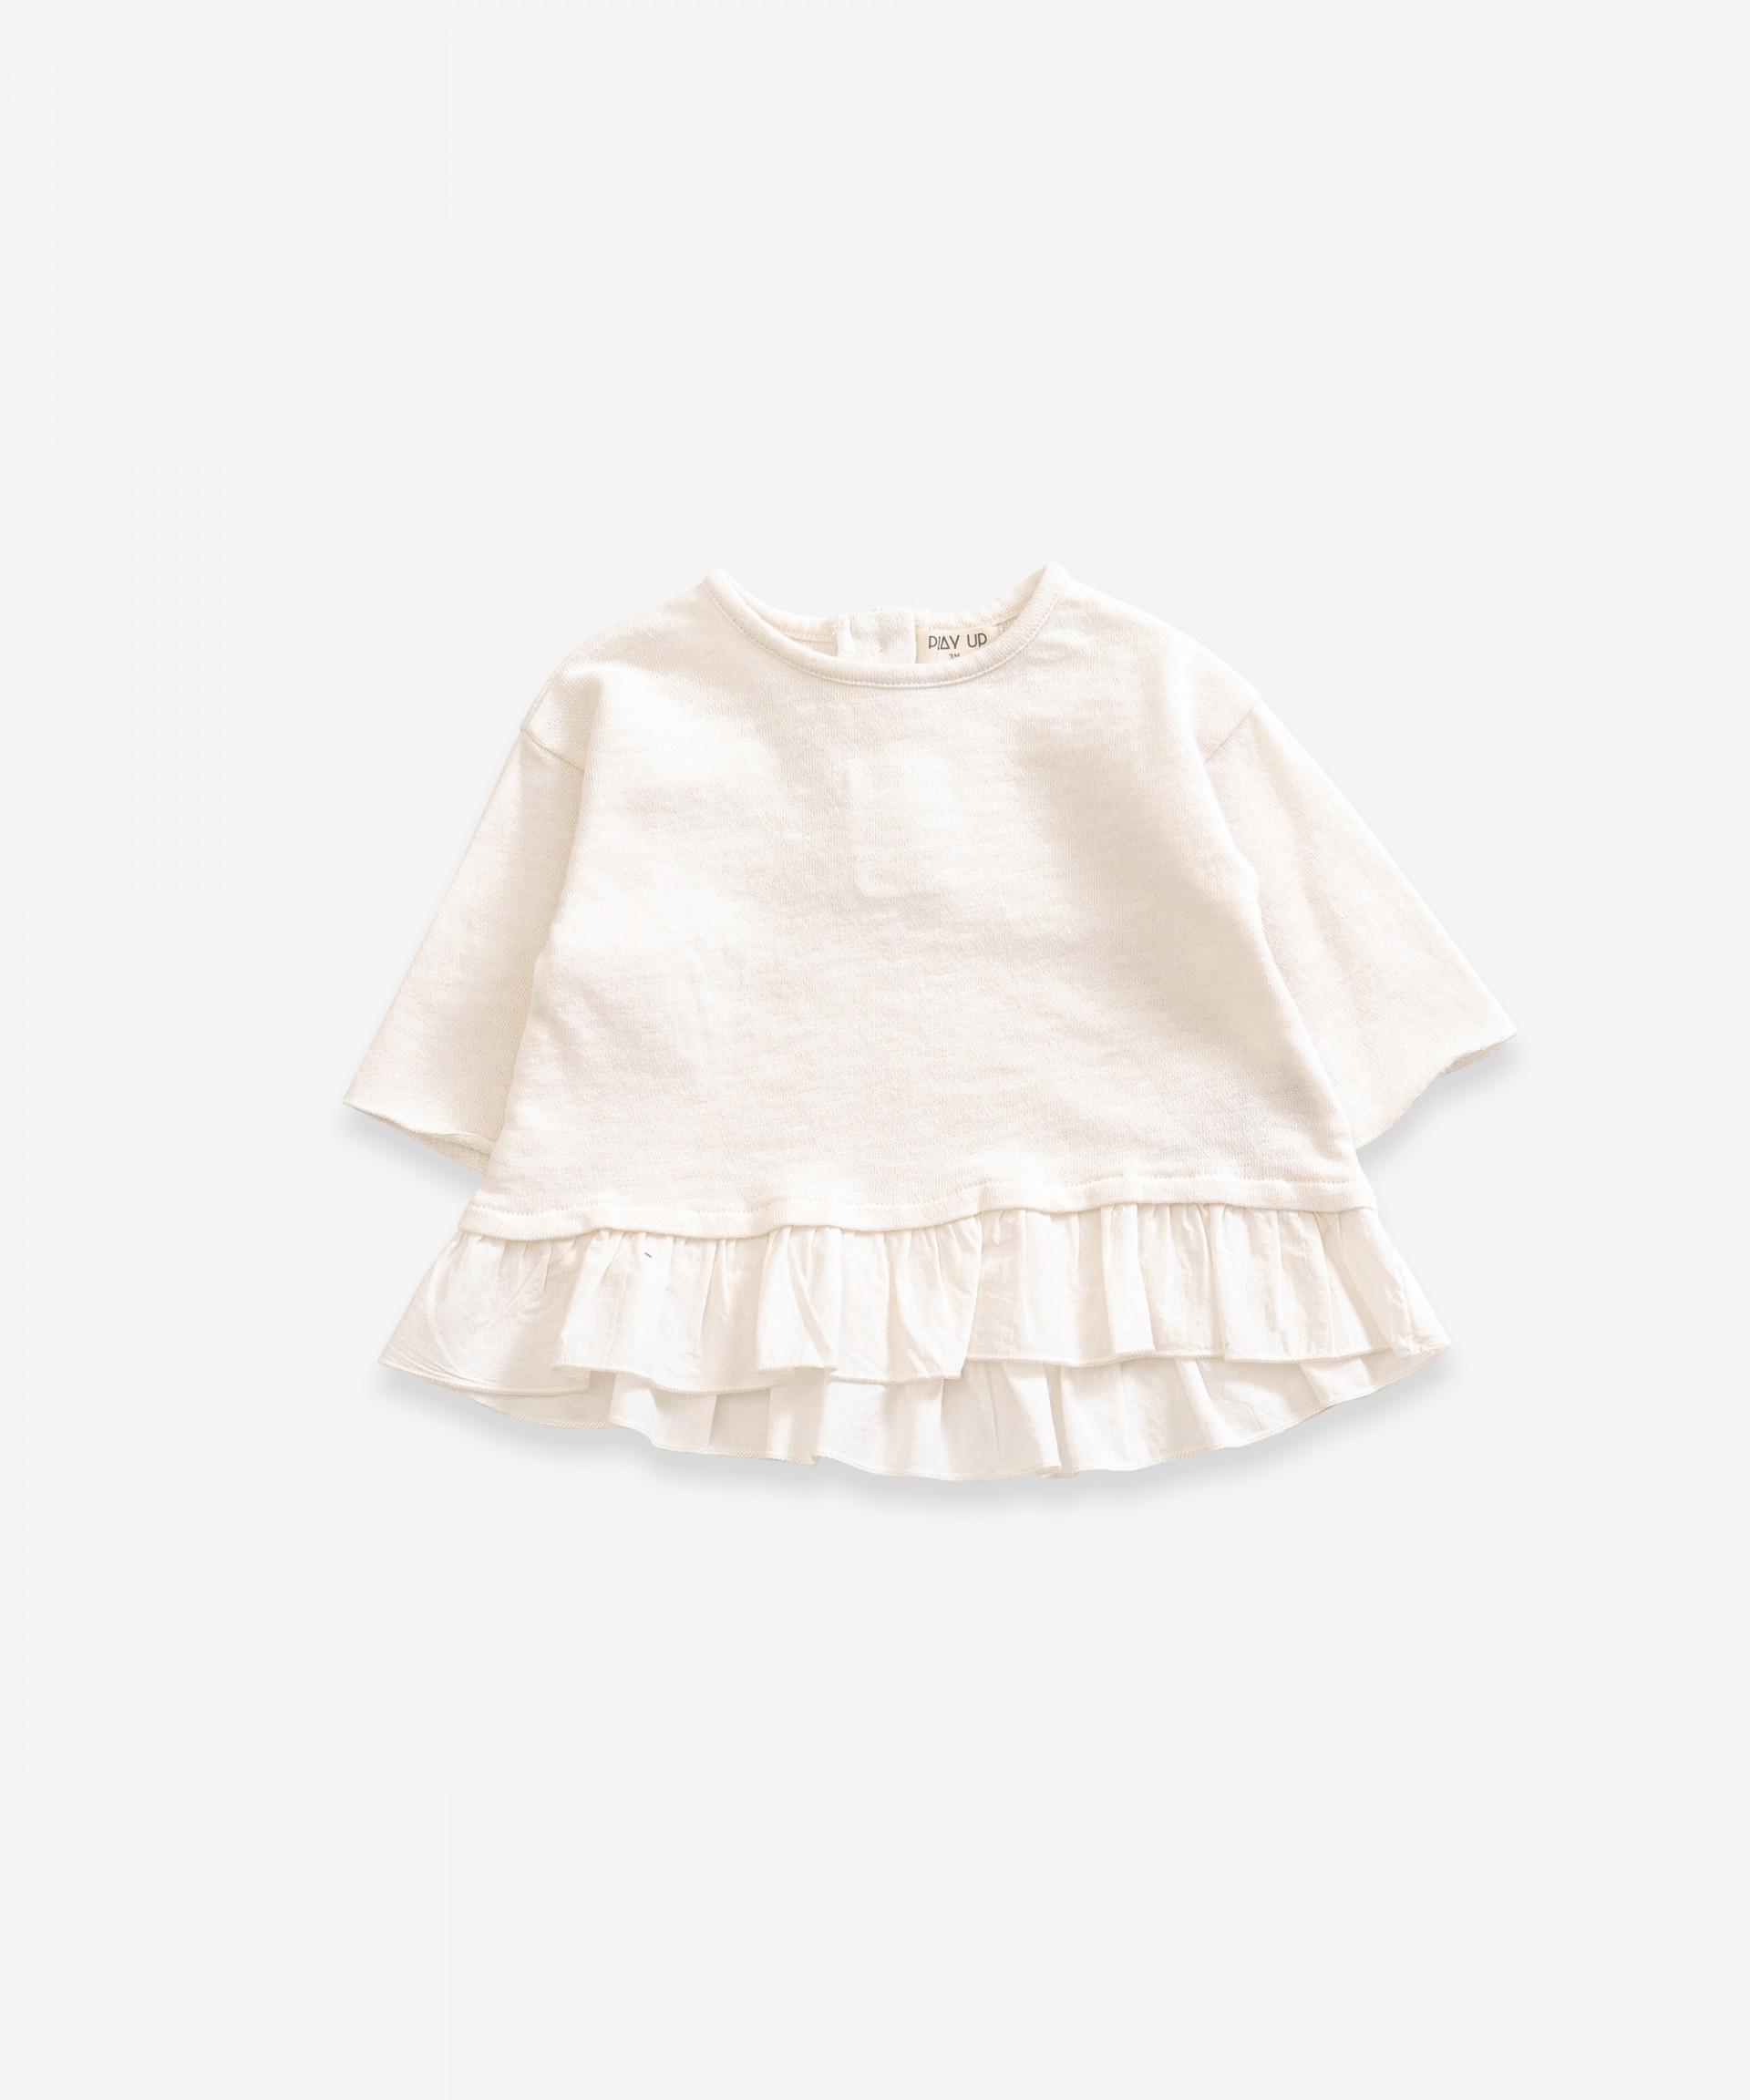 Jersey de algodón orgánico con volante | Weaving